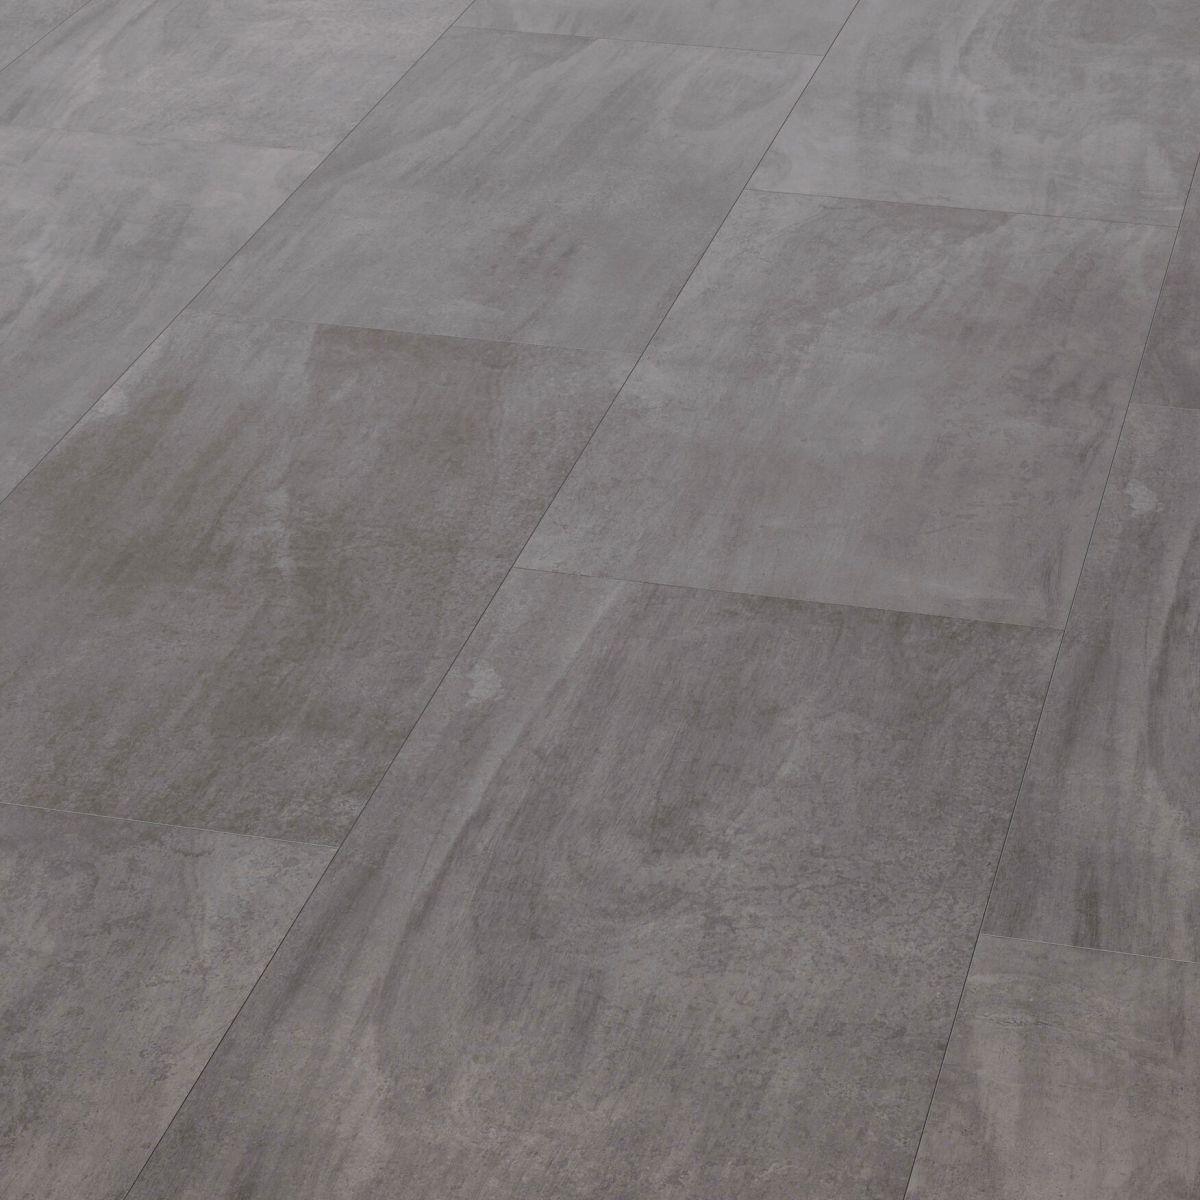 Avatara 3D print vloer steen O9 diagonaal